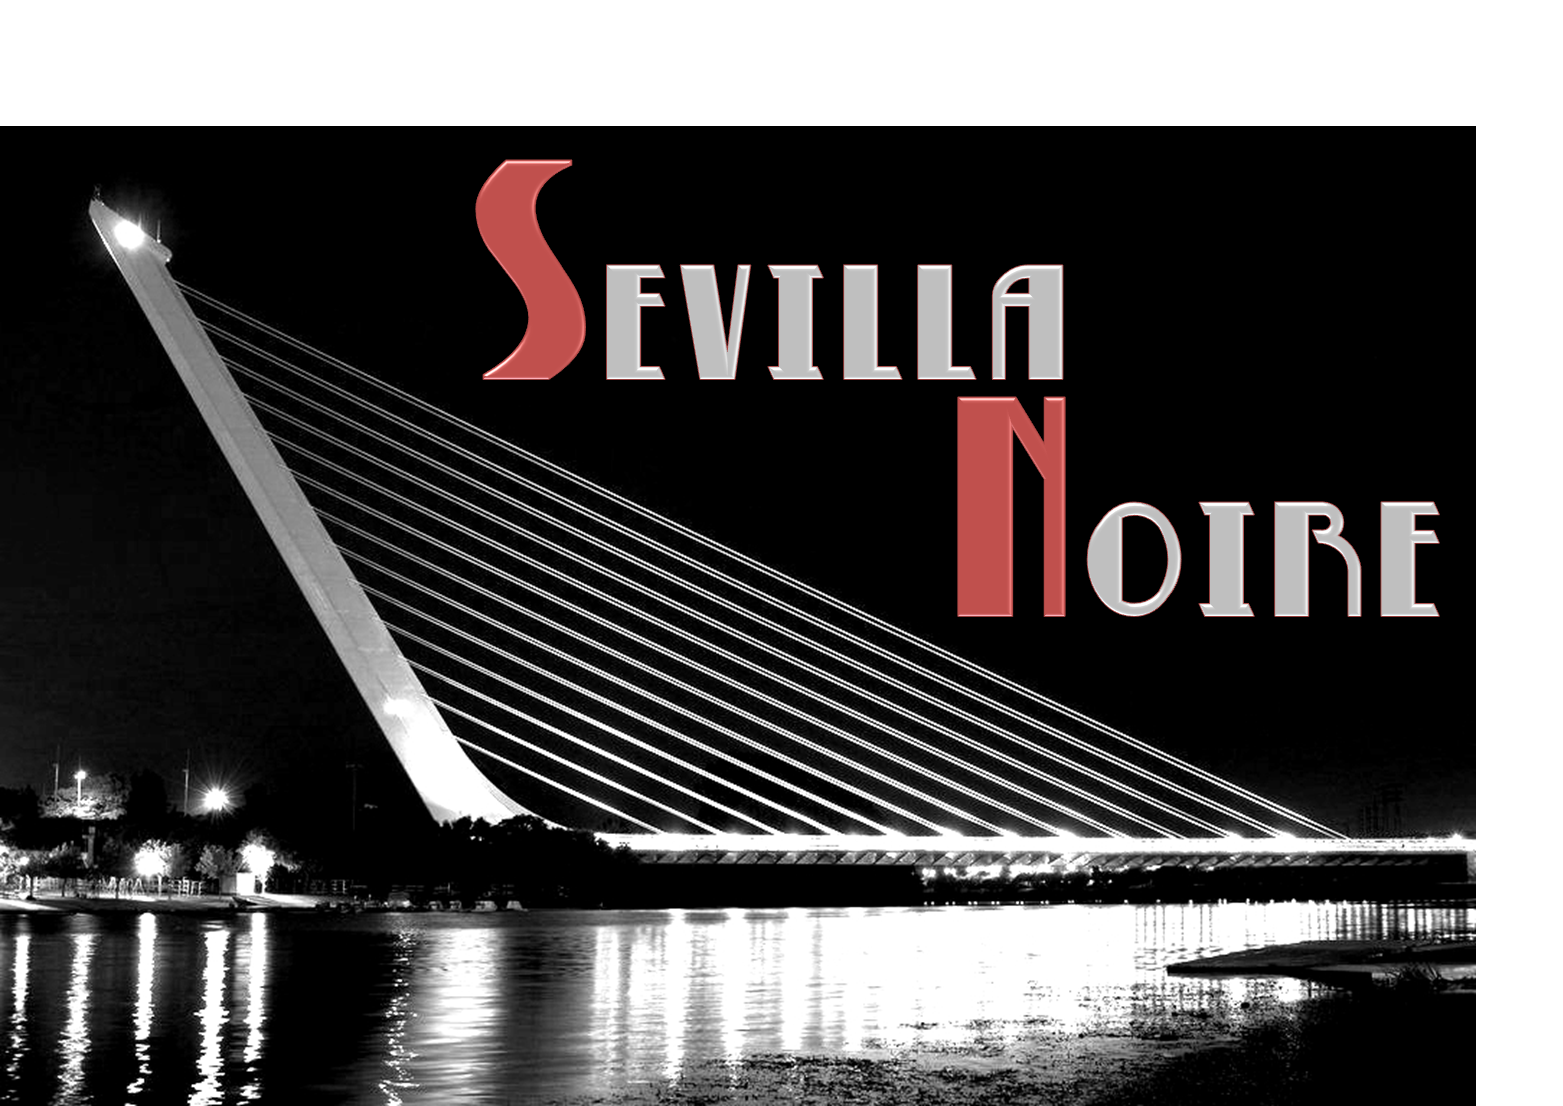 Sevilla Noire